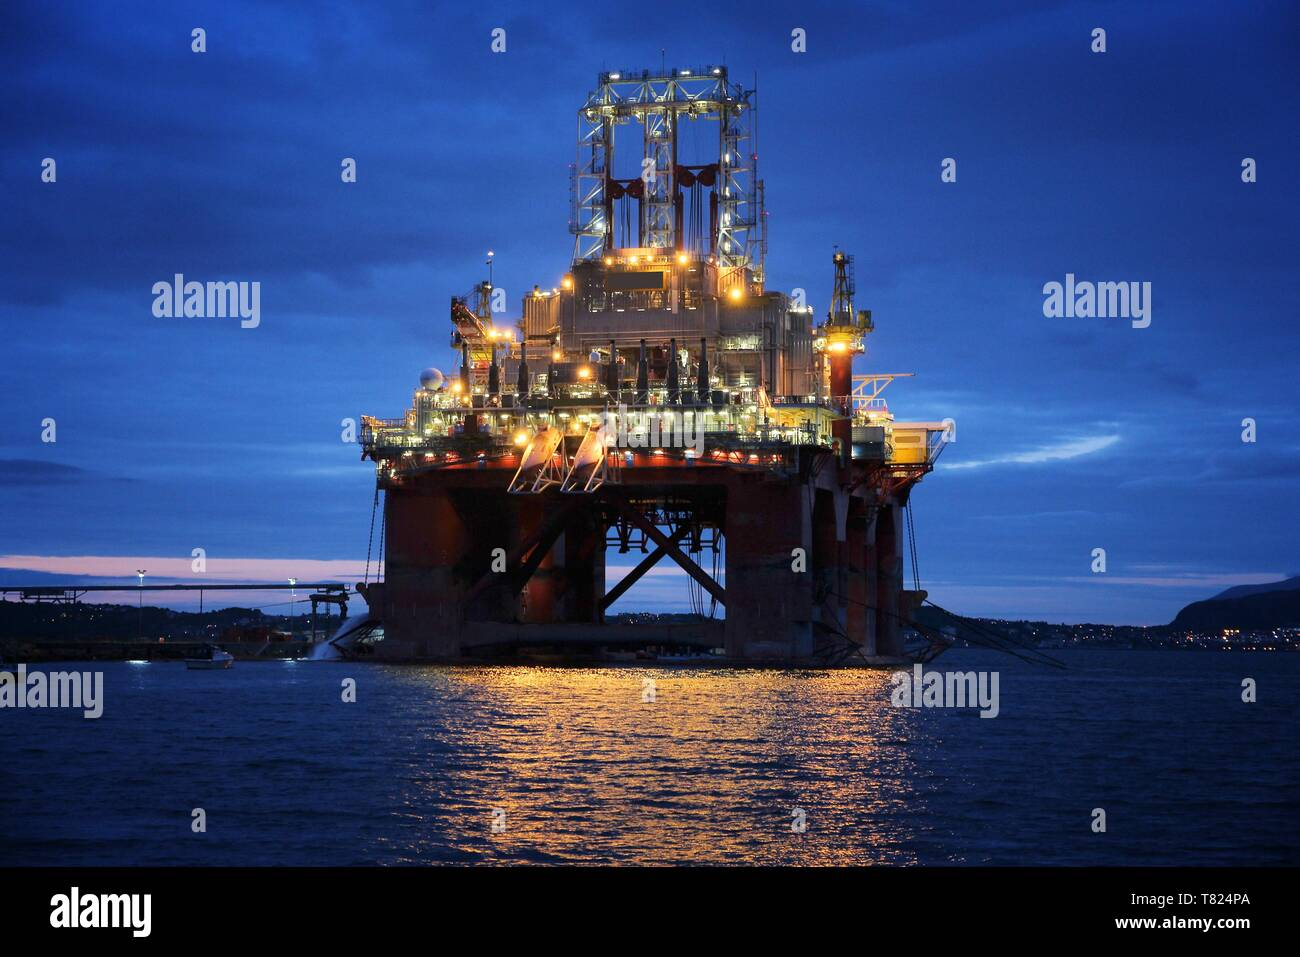 Norwegian Sea Oil Rig Stock Photos & Norwegian Sea Oil Rig